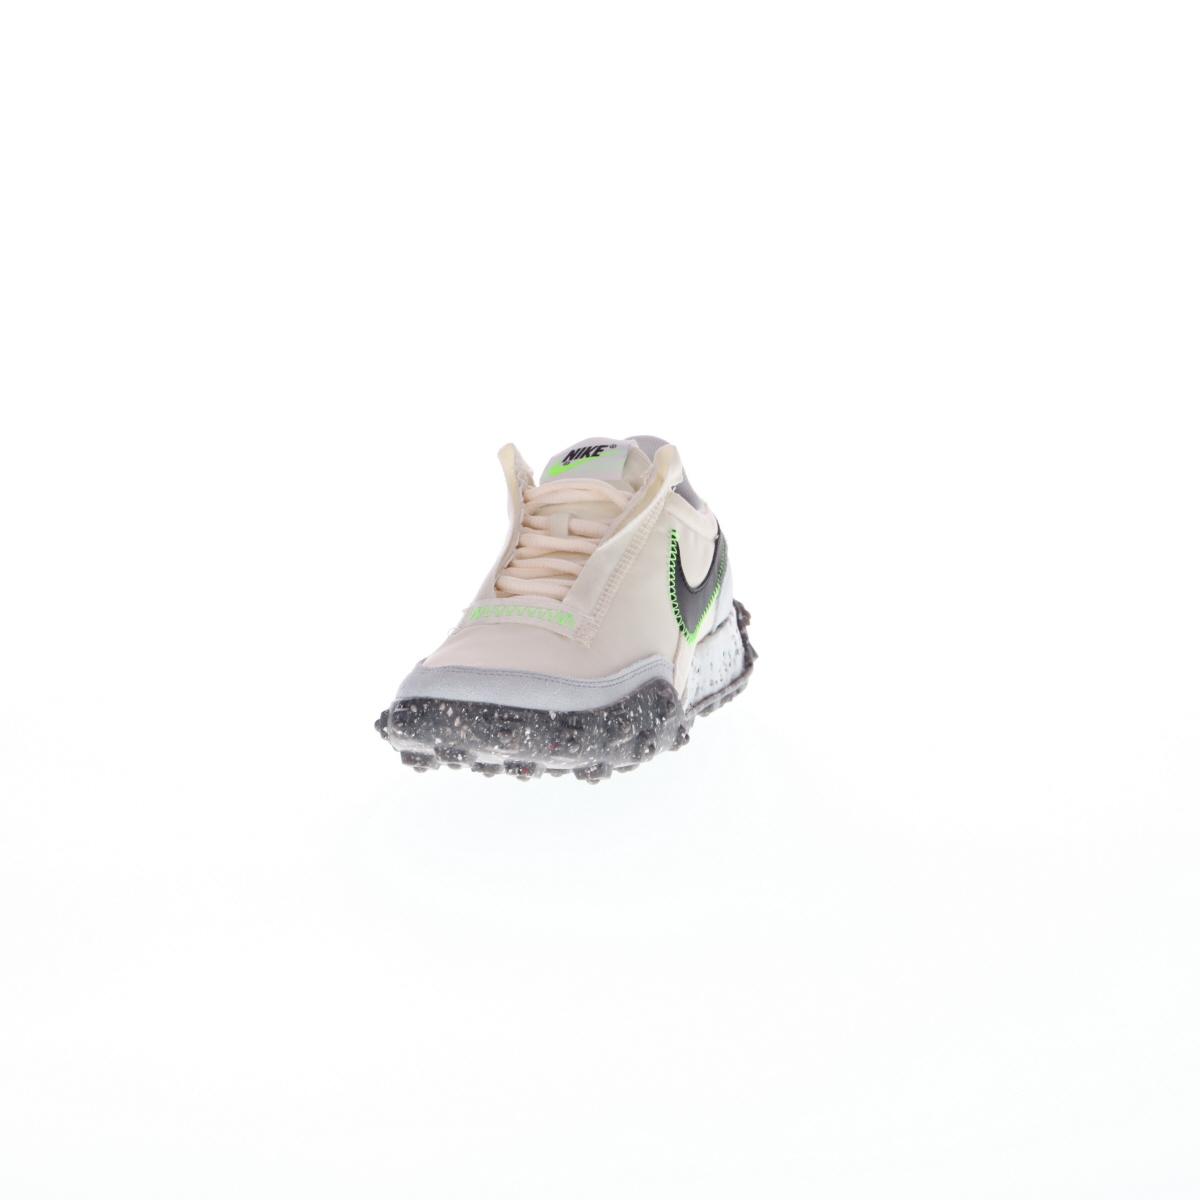 supreme nike sb collab women boots clearance code